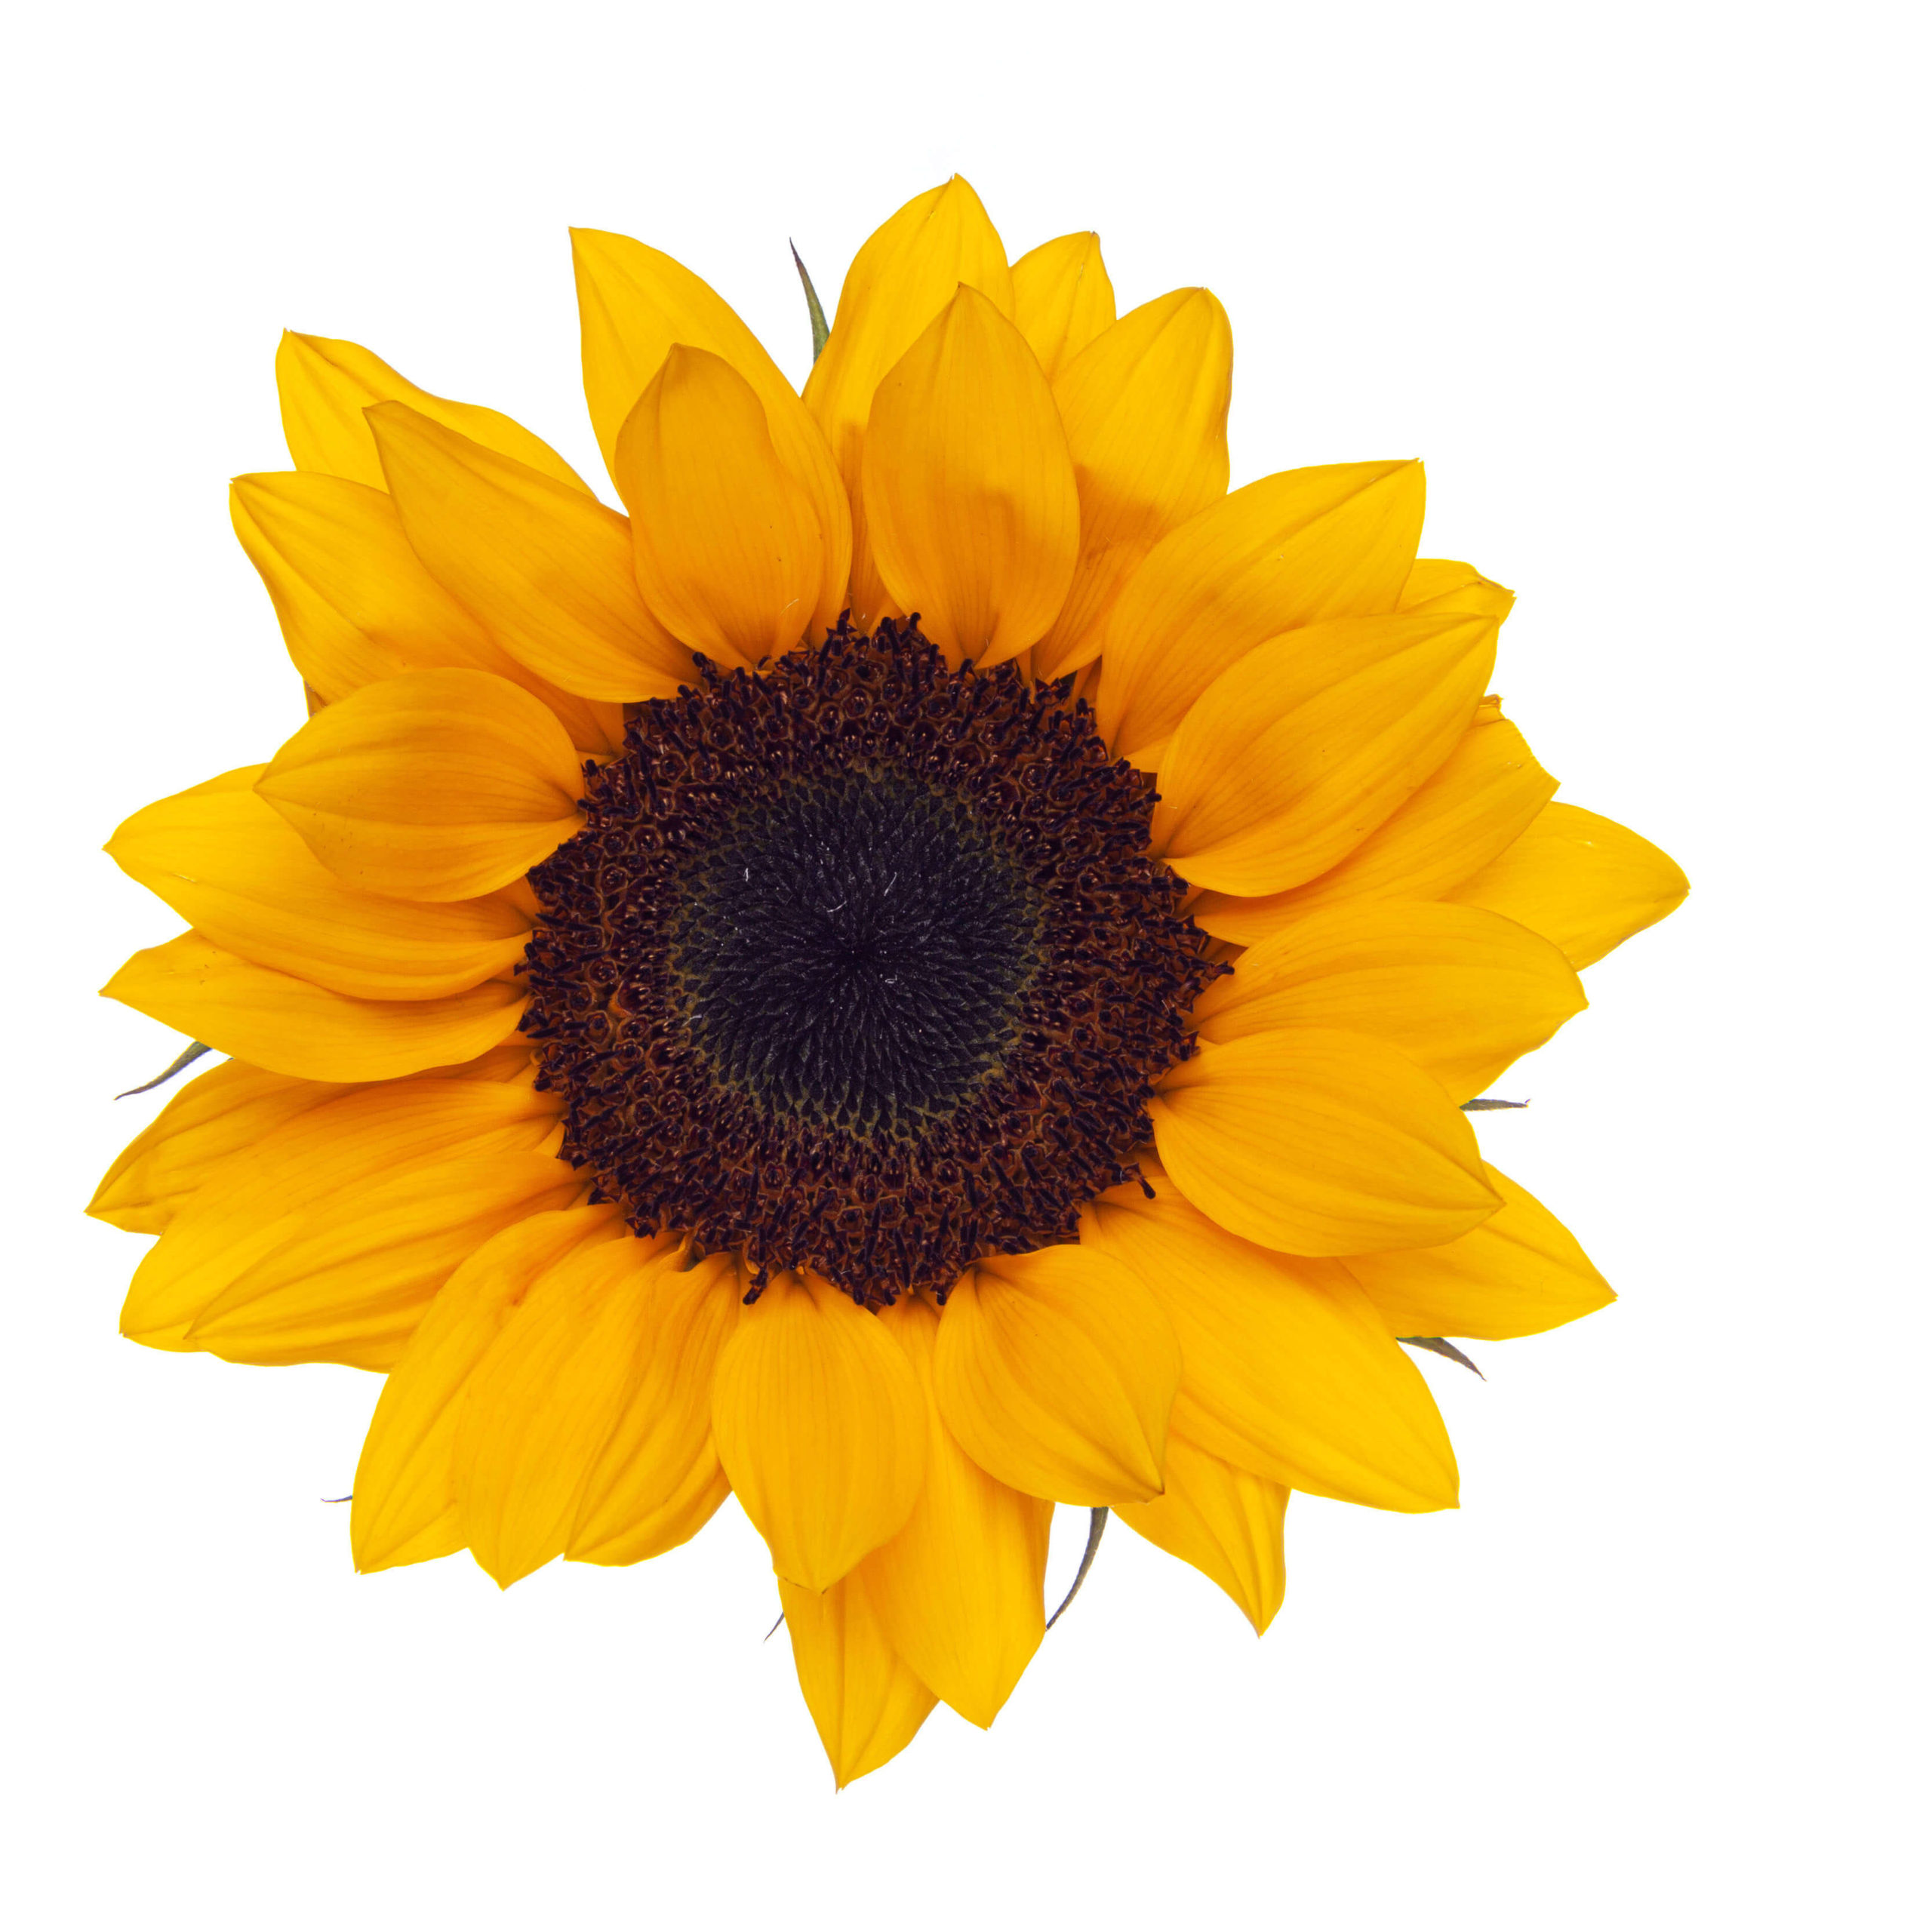 Sunflower Sunbright | The Queen's Flowers